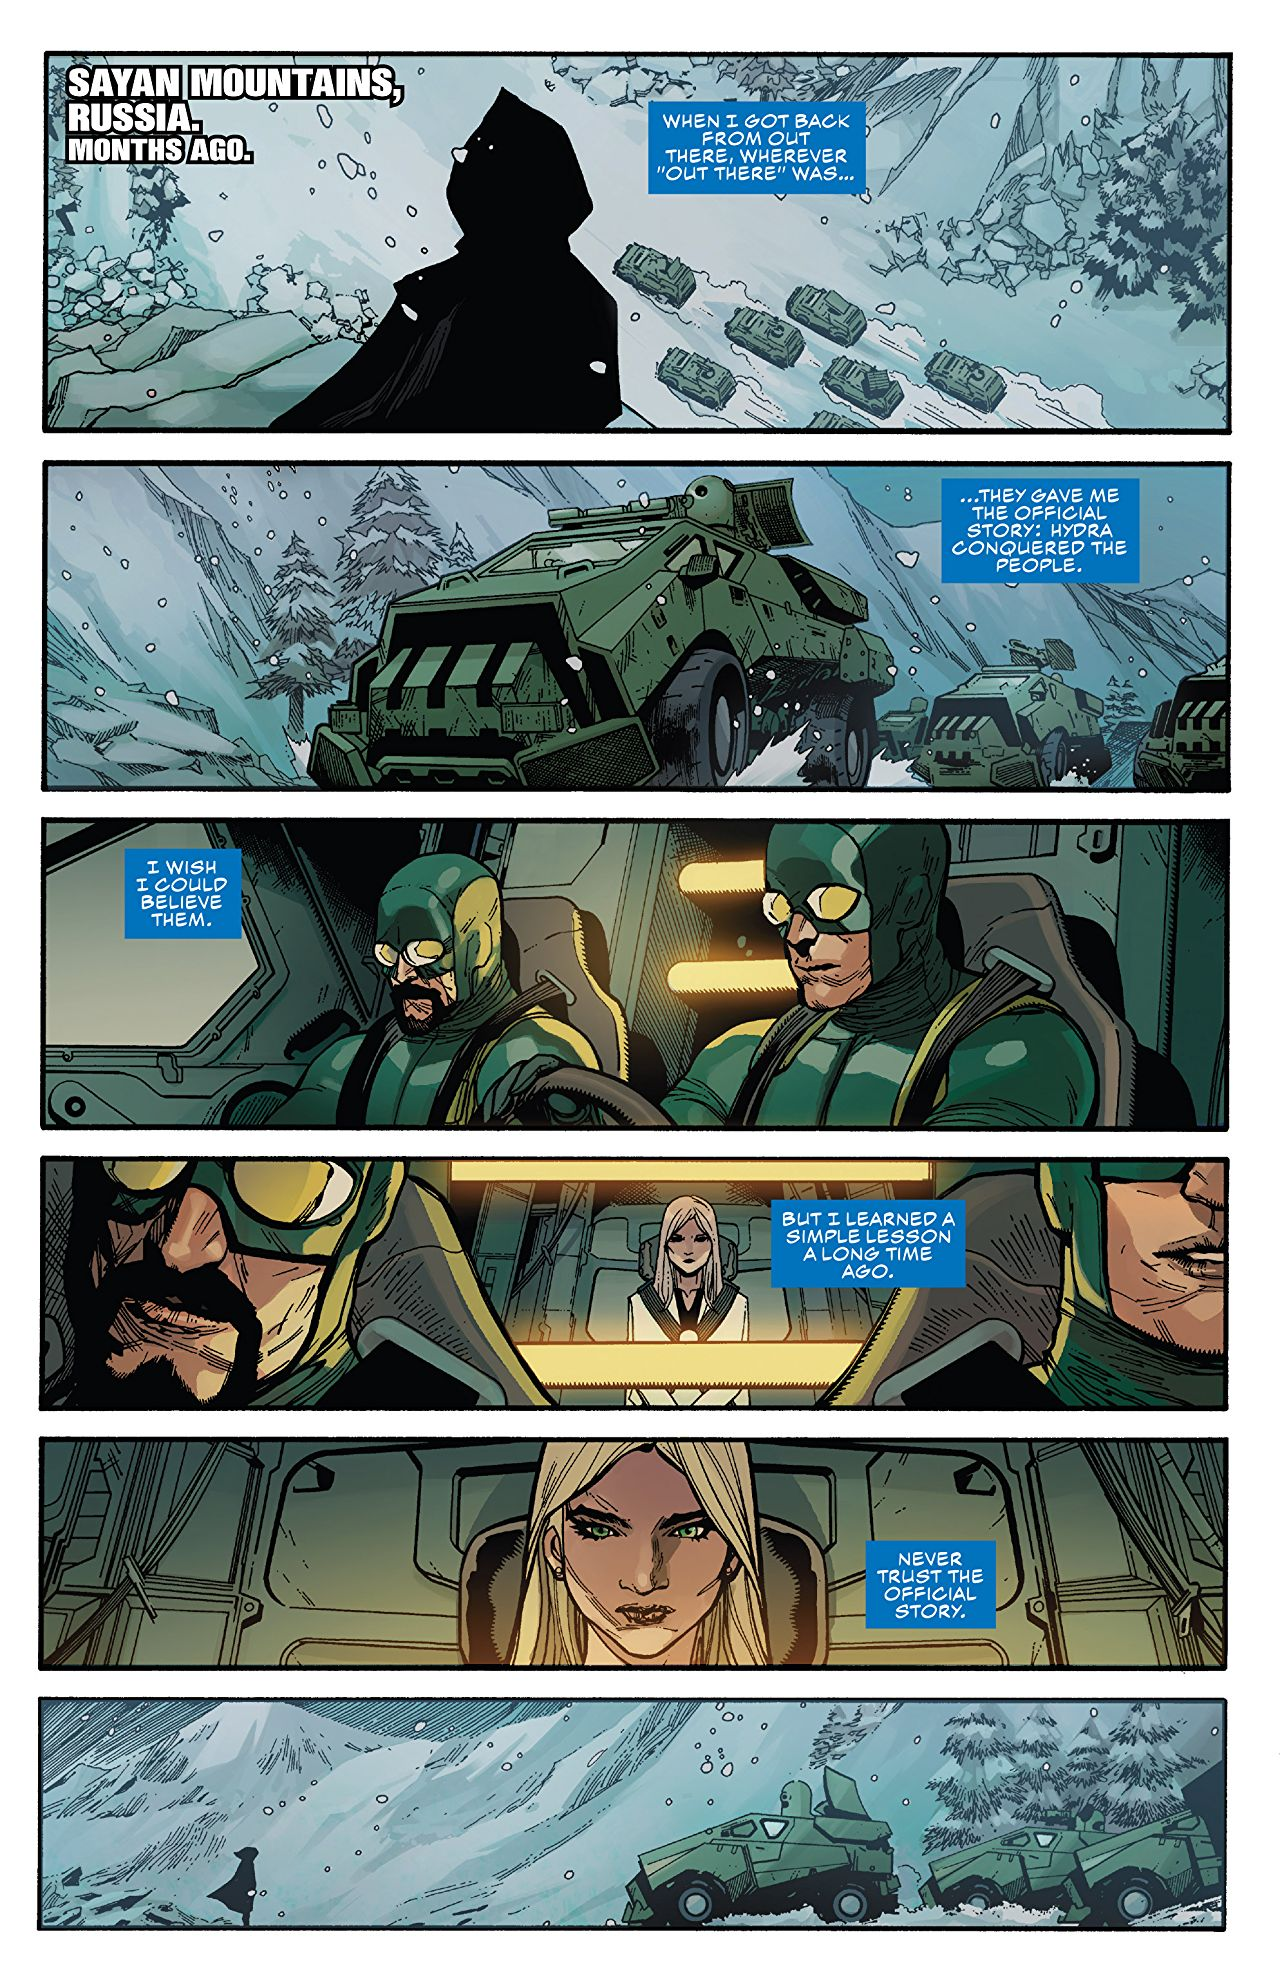 Captain America 1.2 Comic Book Review